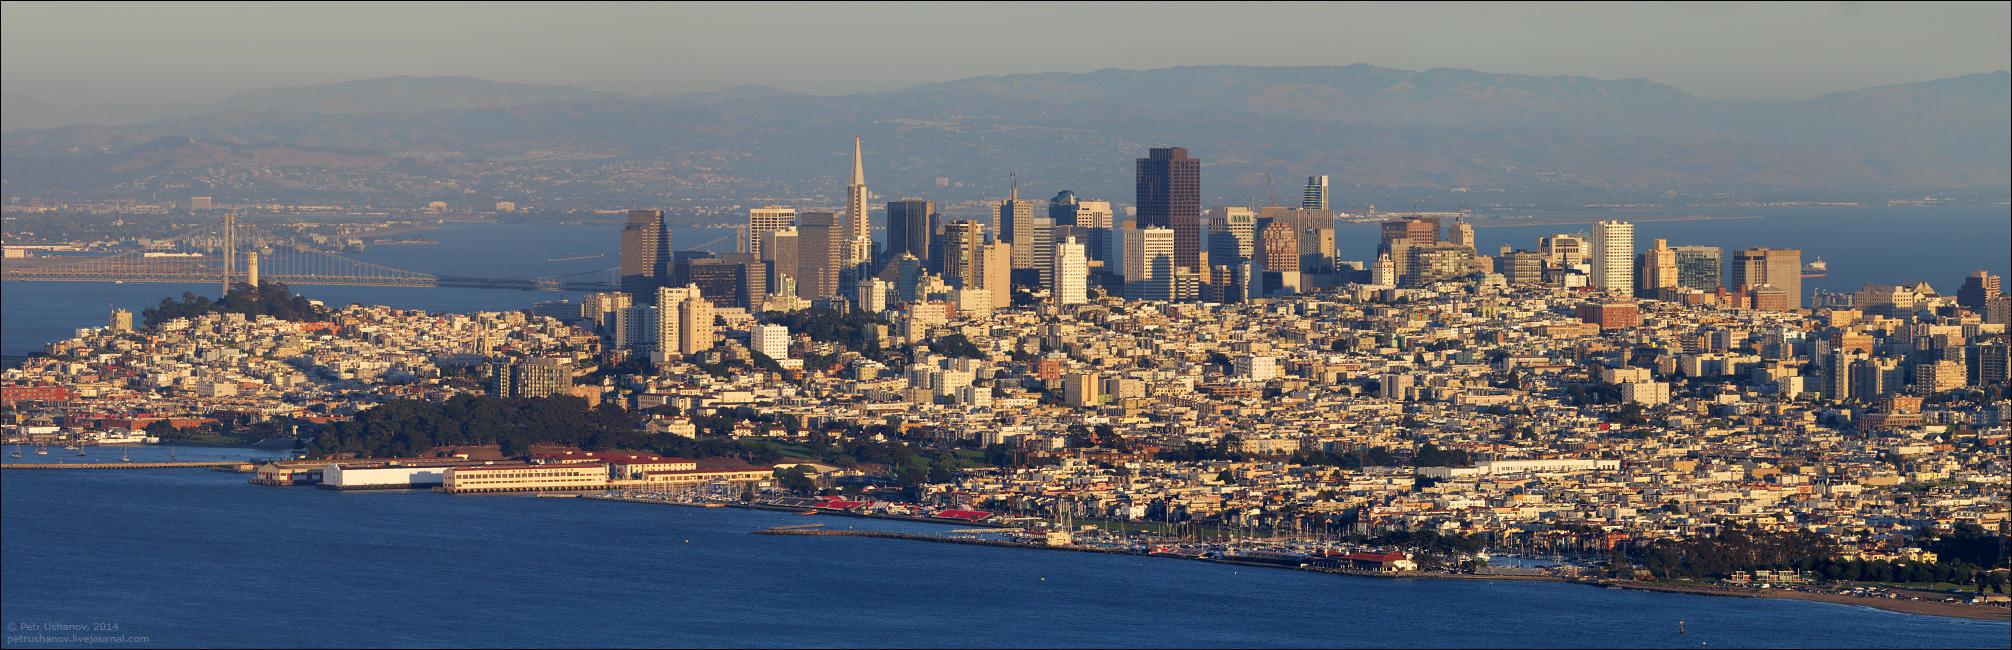 SFpanorama02 Сан Франциско   панорамы города